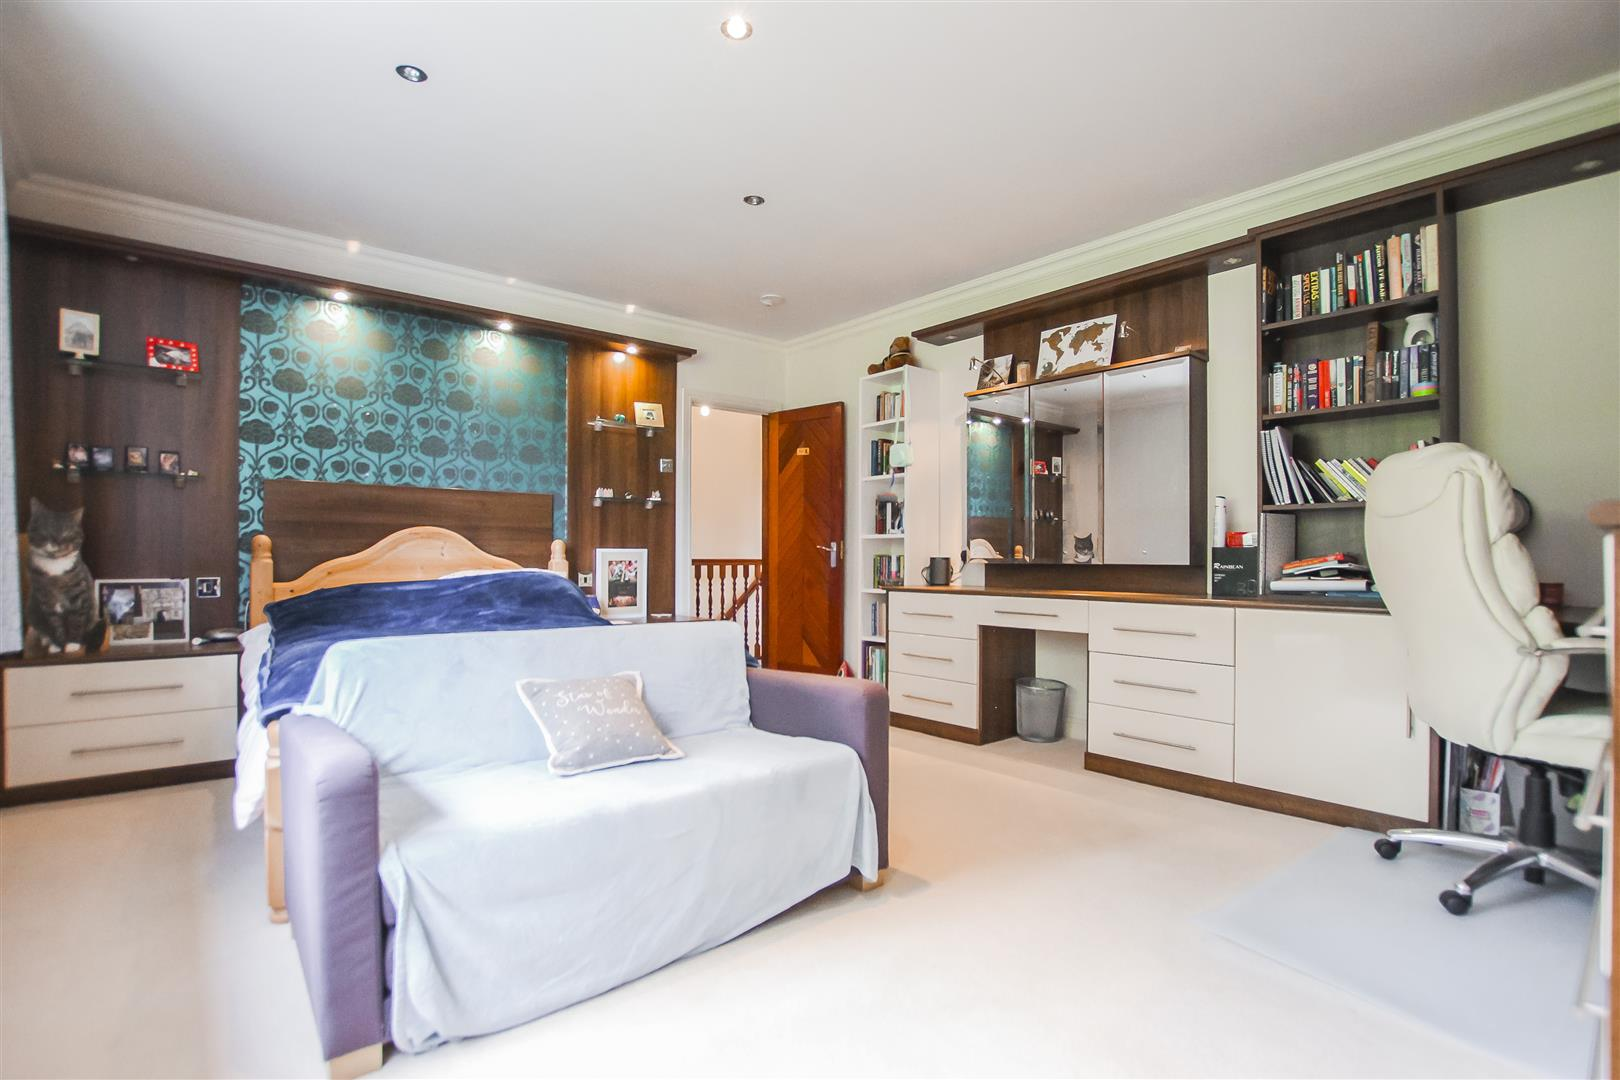 6 Bedroom Detached House For Sale - Bedroom Three